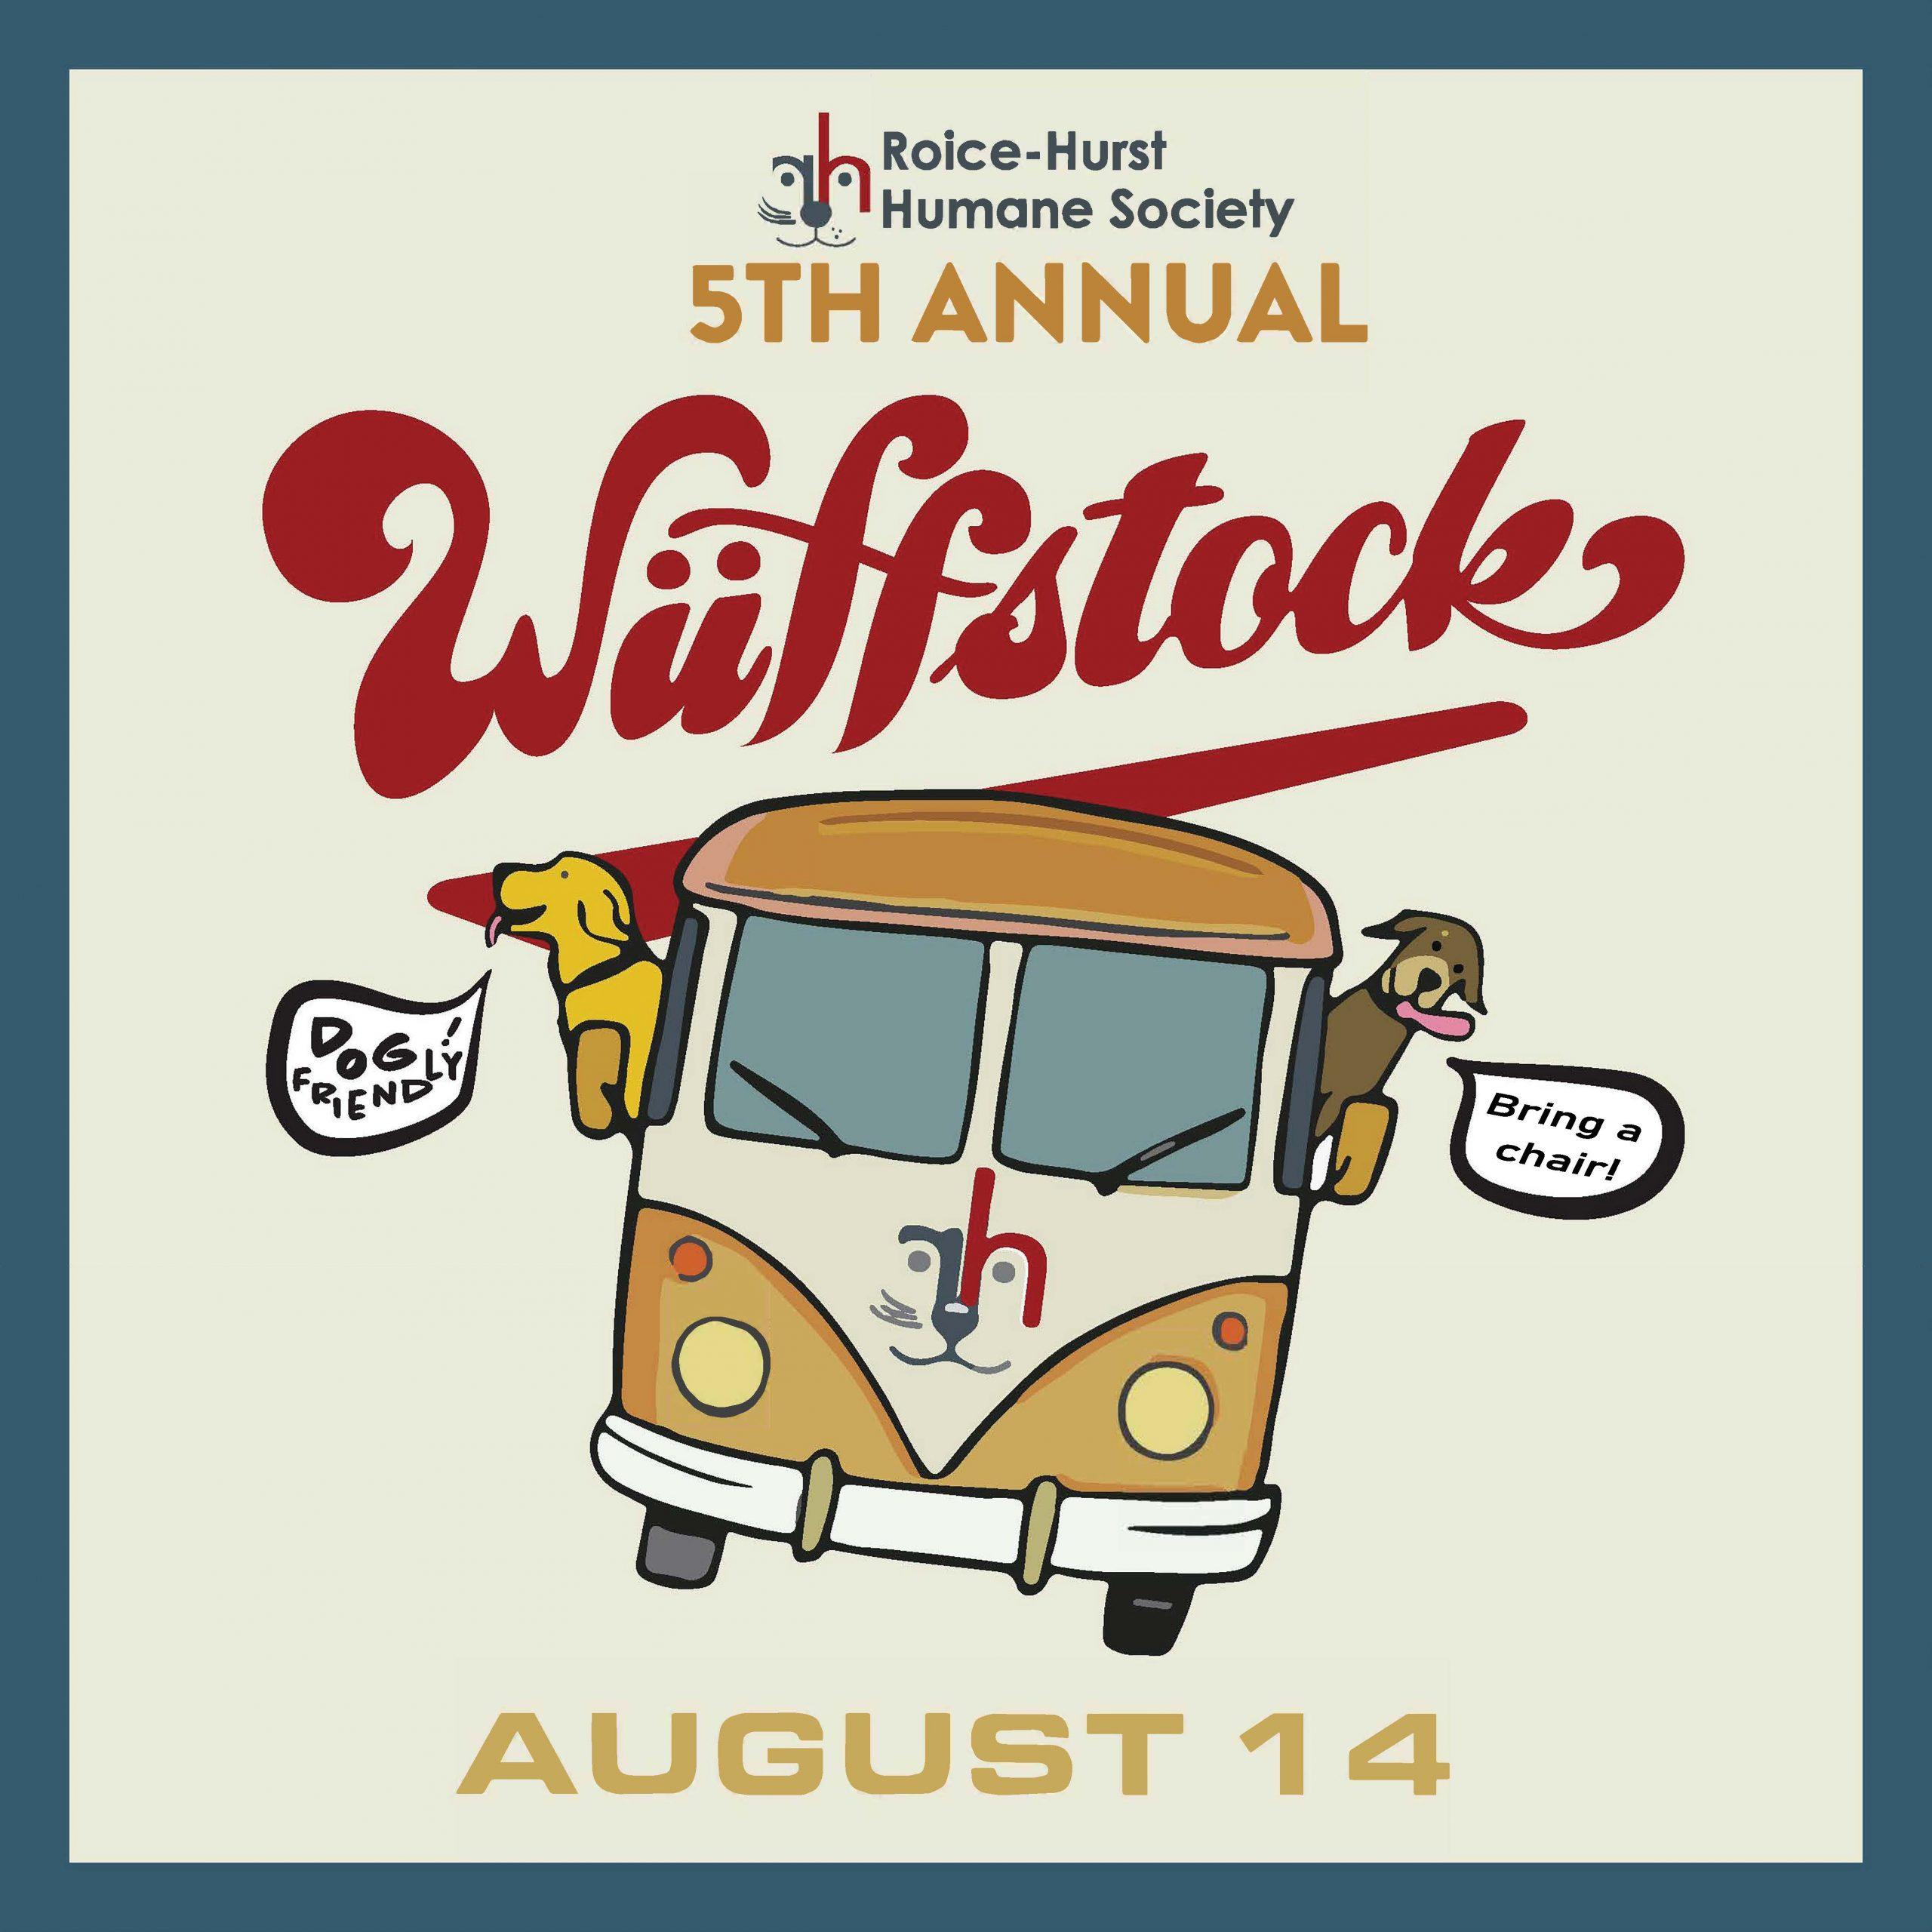 Wuffstock Music Festival